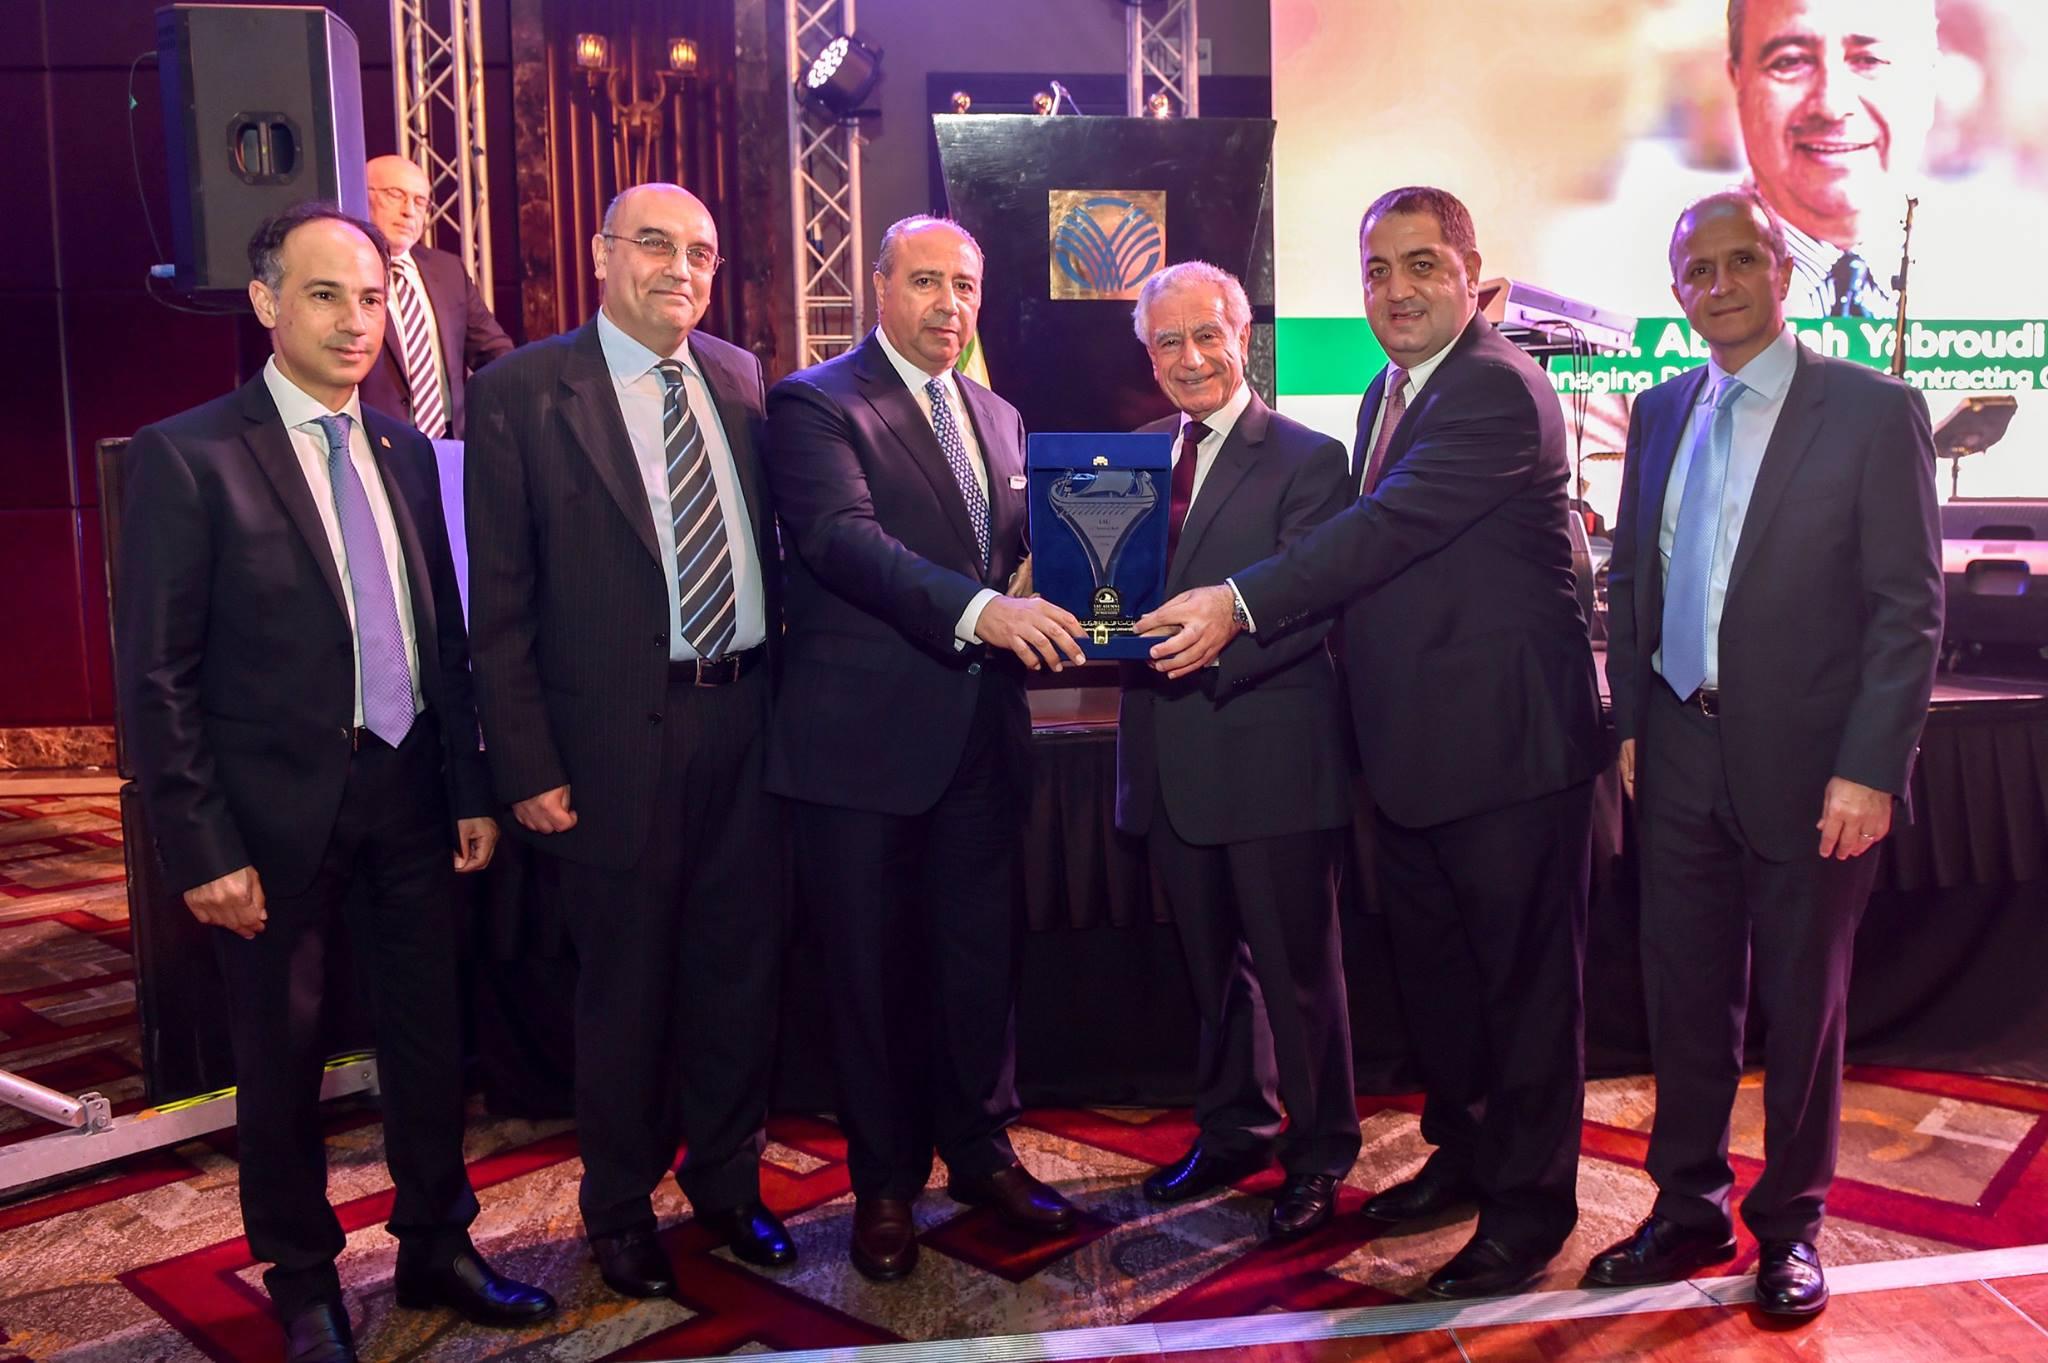 Abu Dhabi Chapter 23rd Annual Dinner.jpg